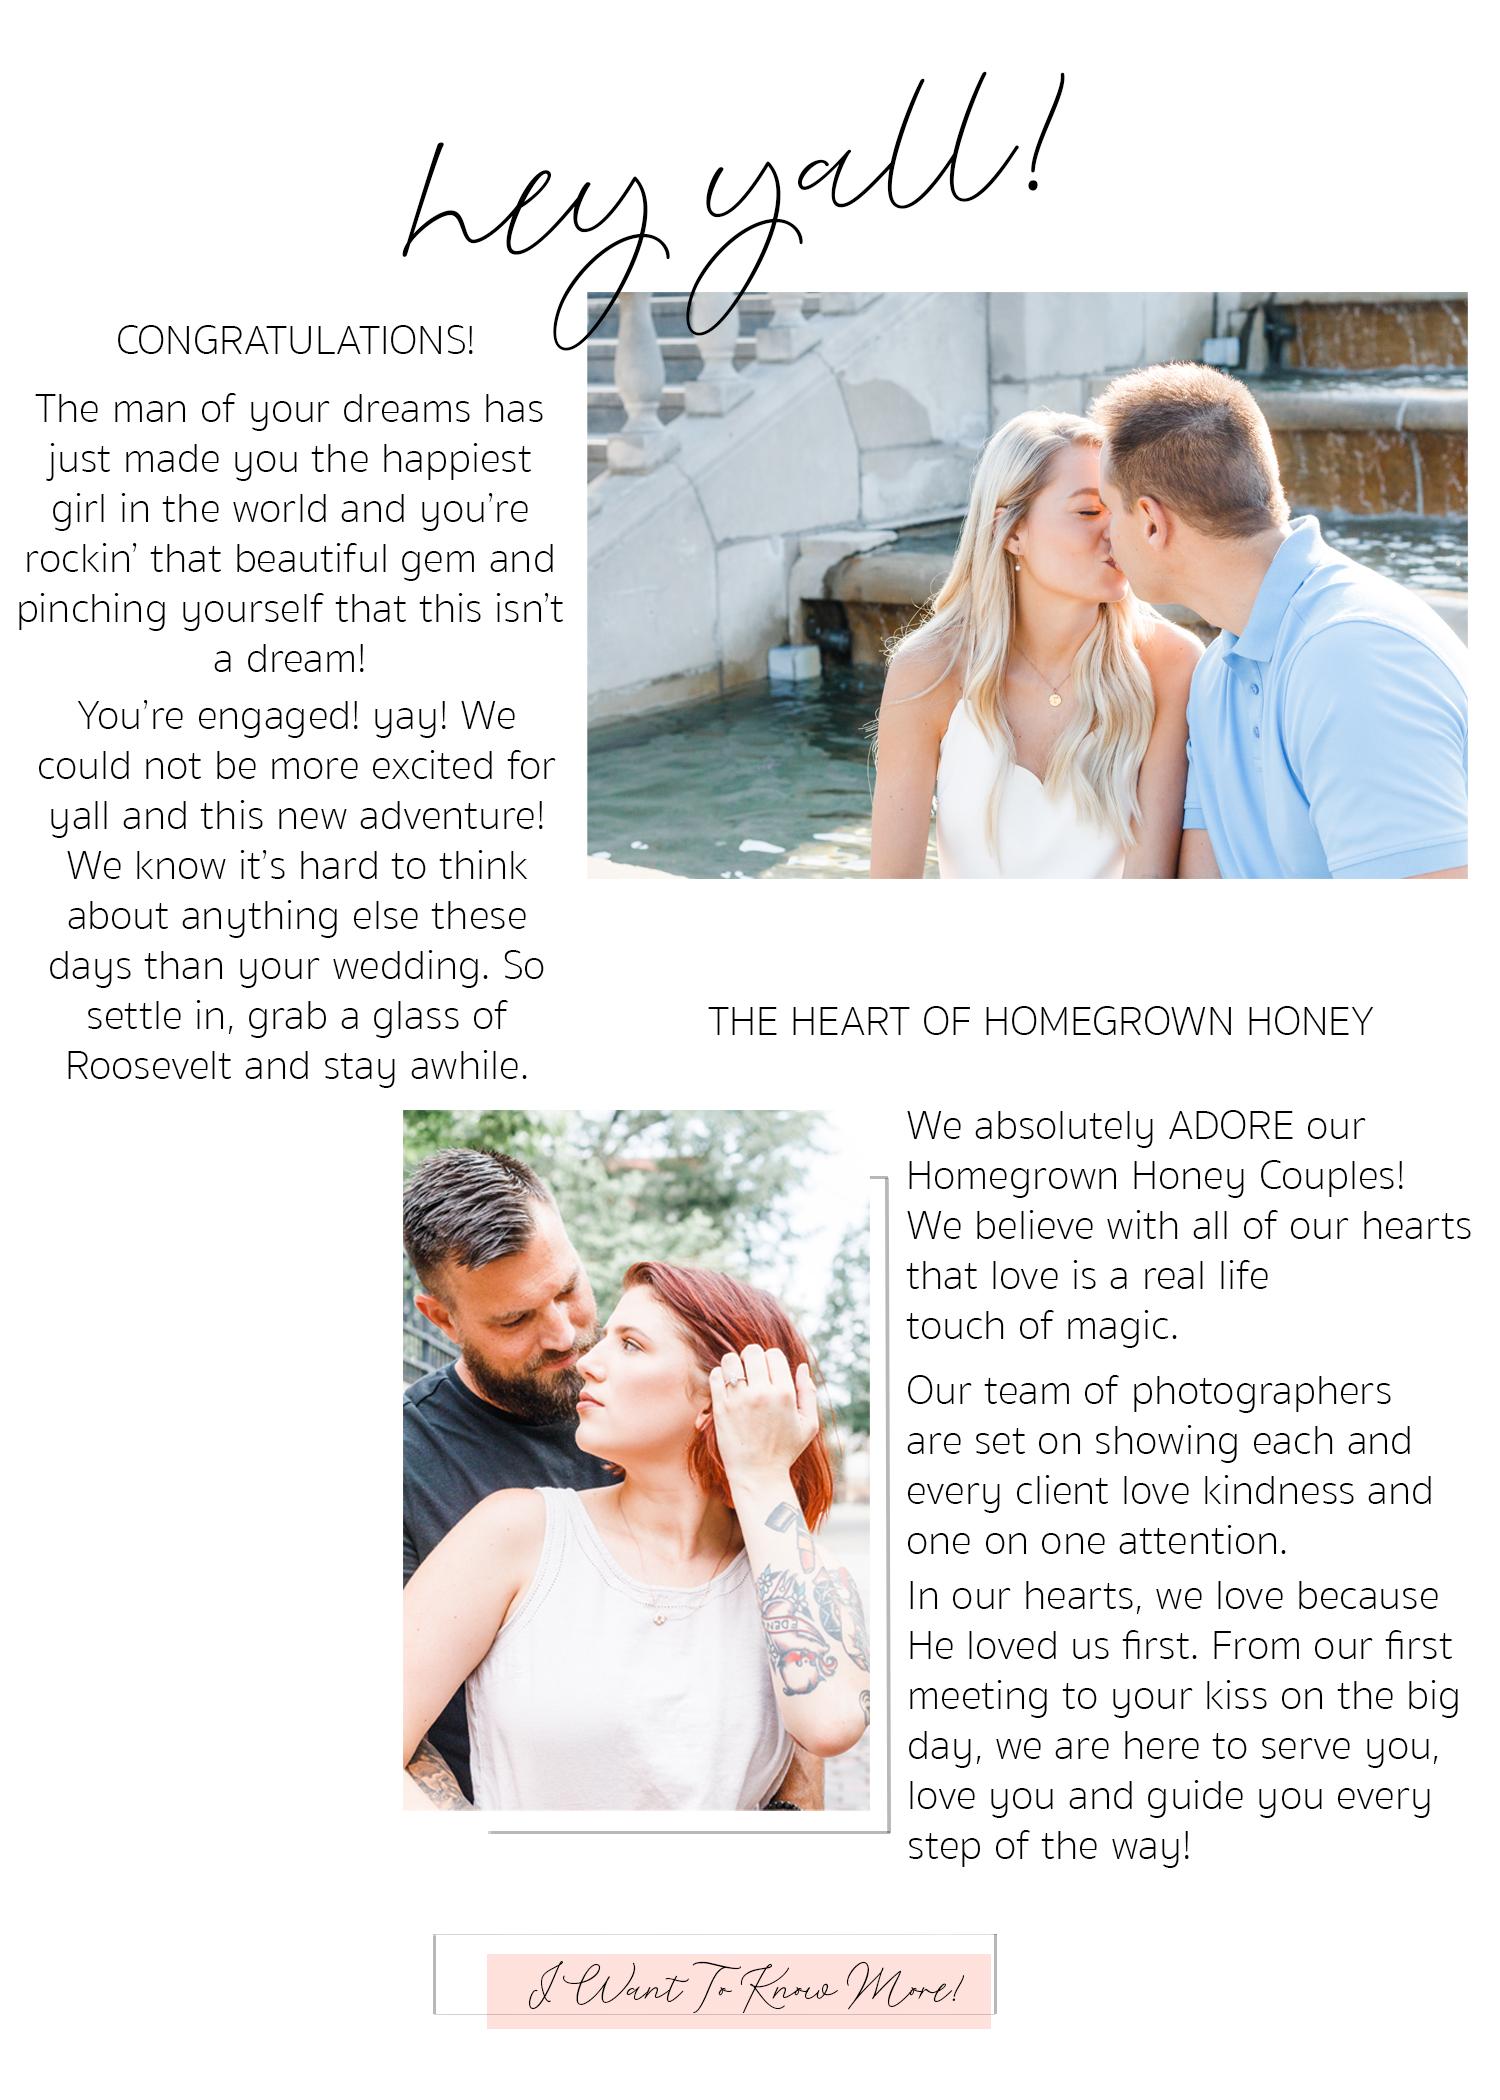 wedding hhp home page.jpg